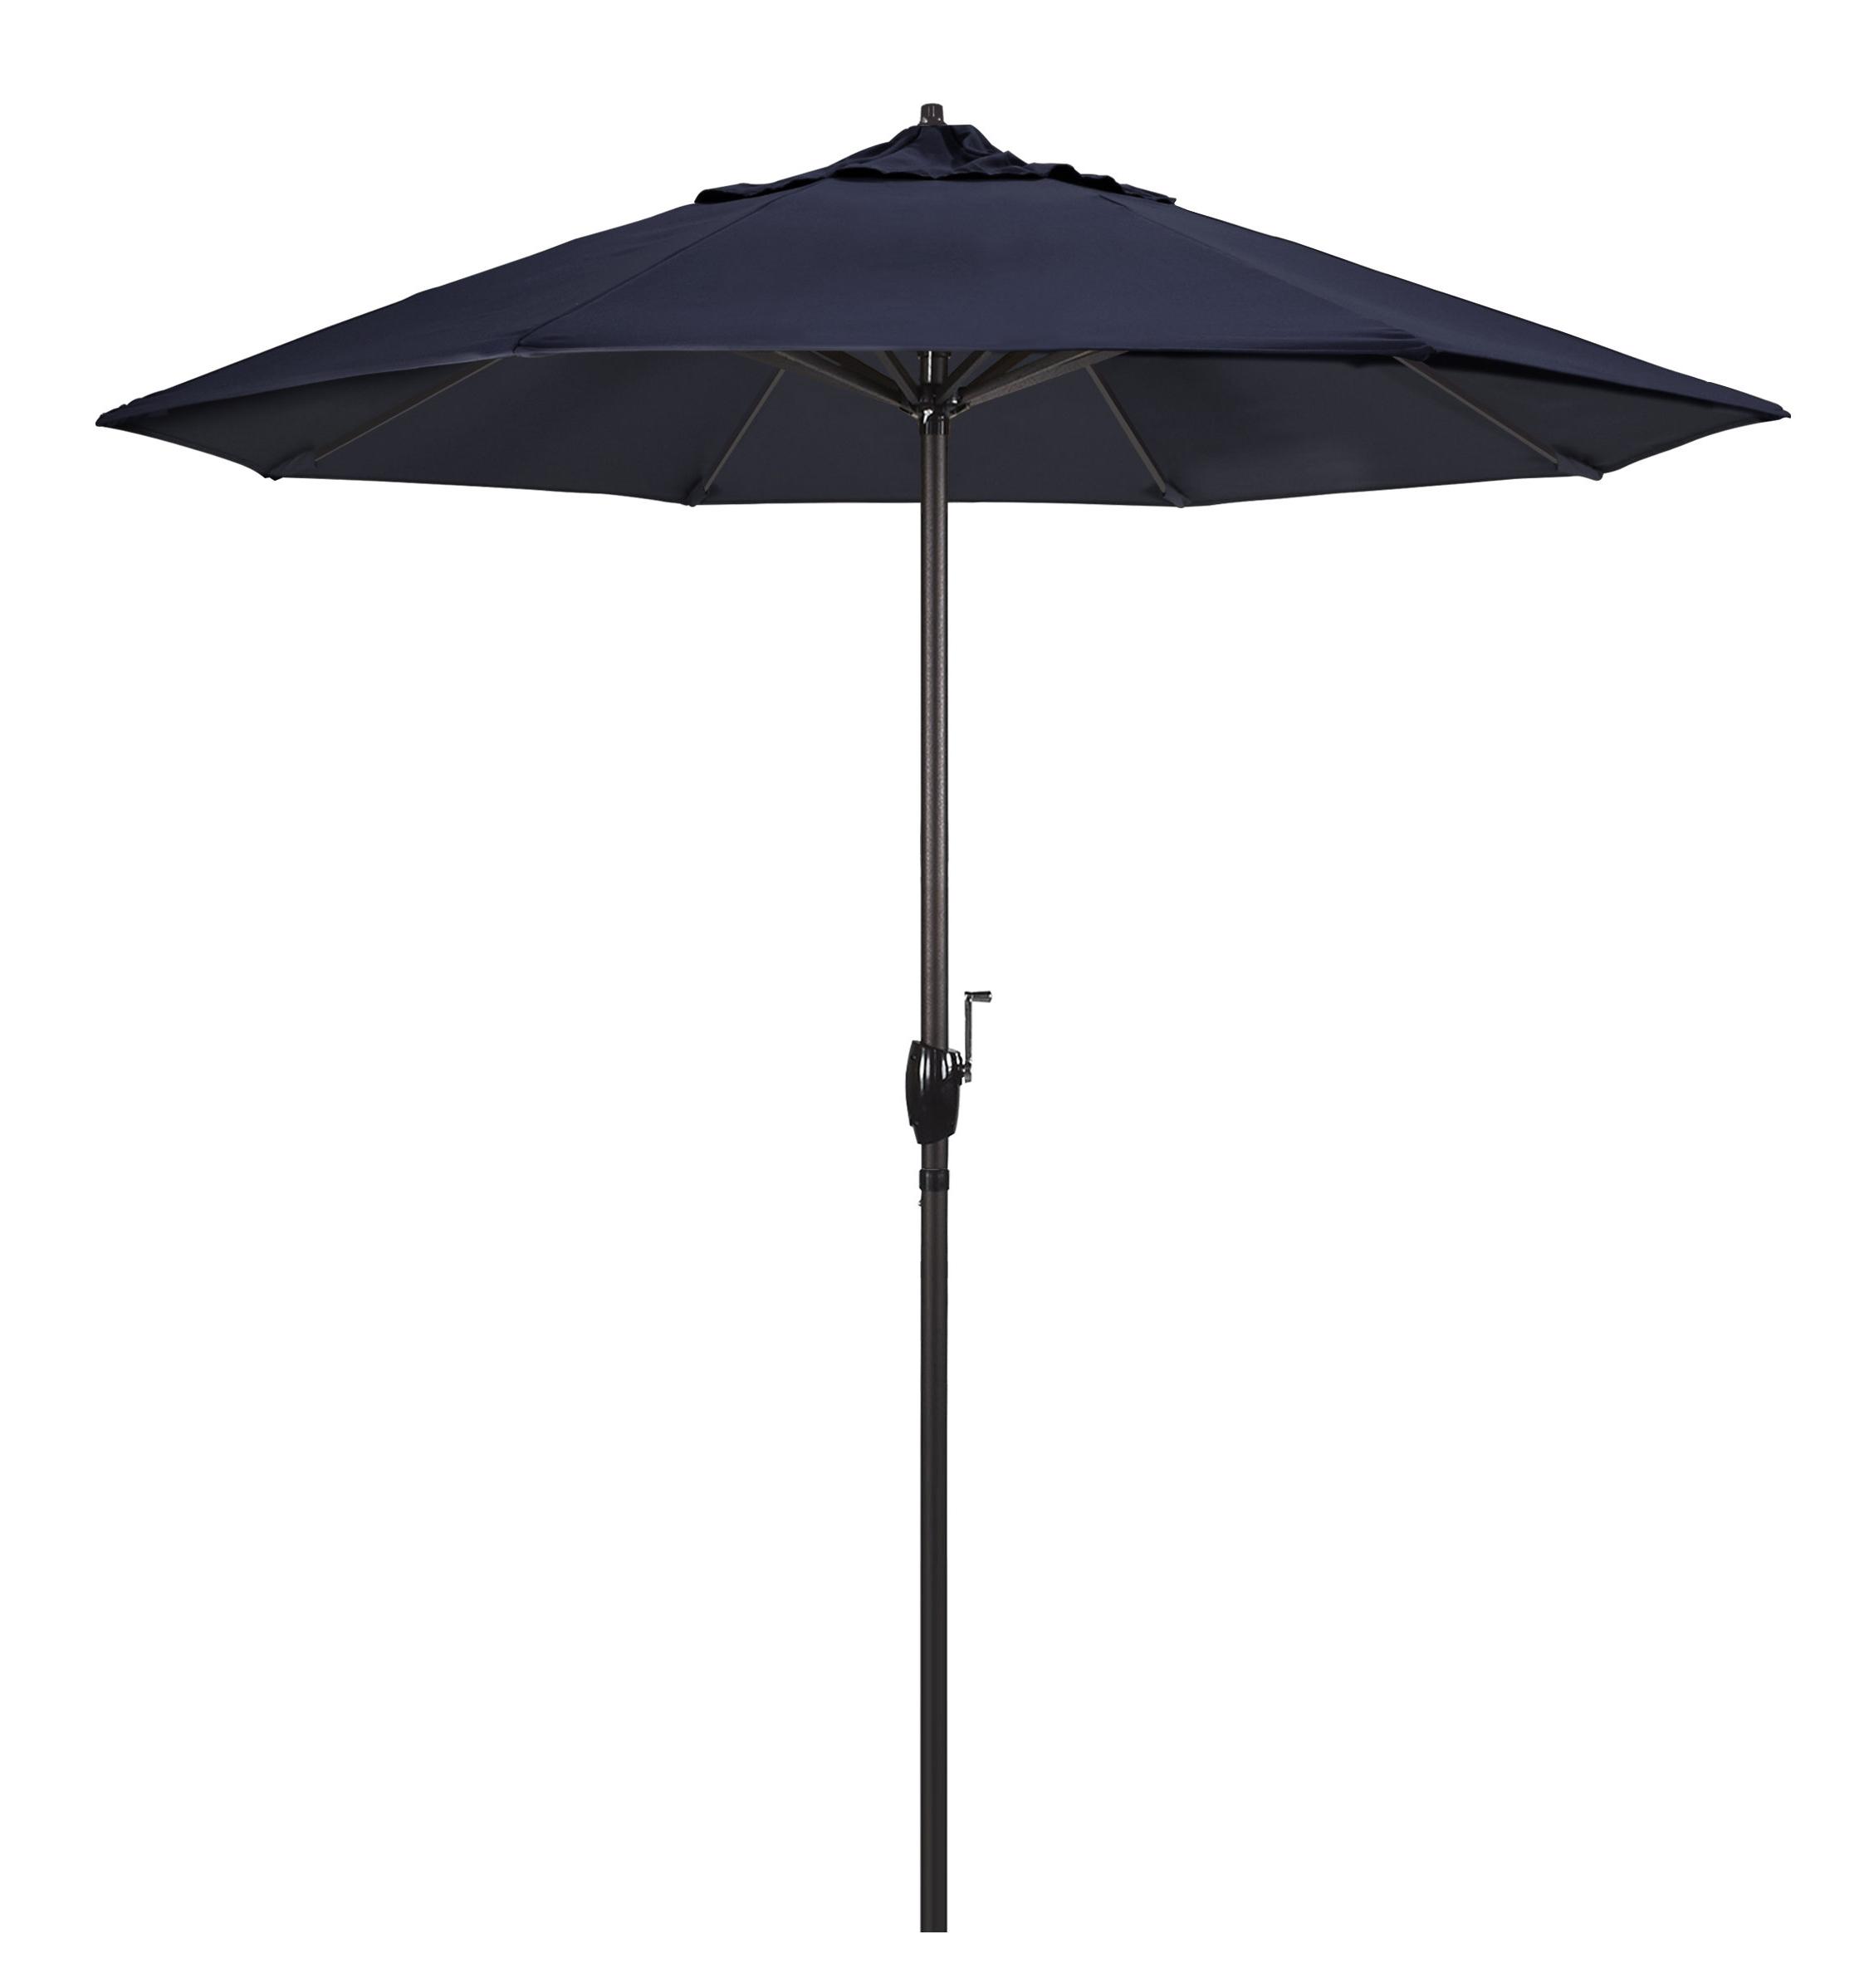 Nunn 8' Market Umbrella For Preferred Julian Market Umbrellas (Gallery 5 of 20)